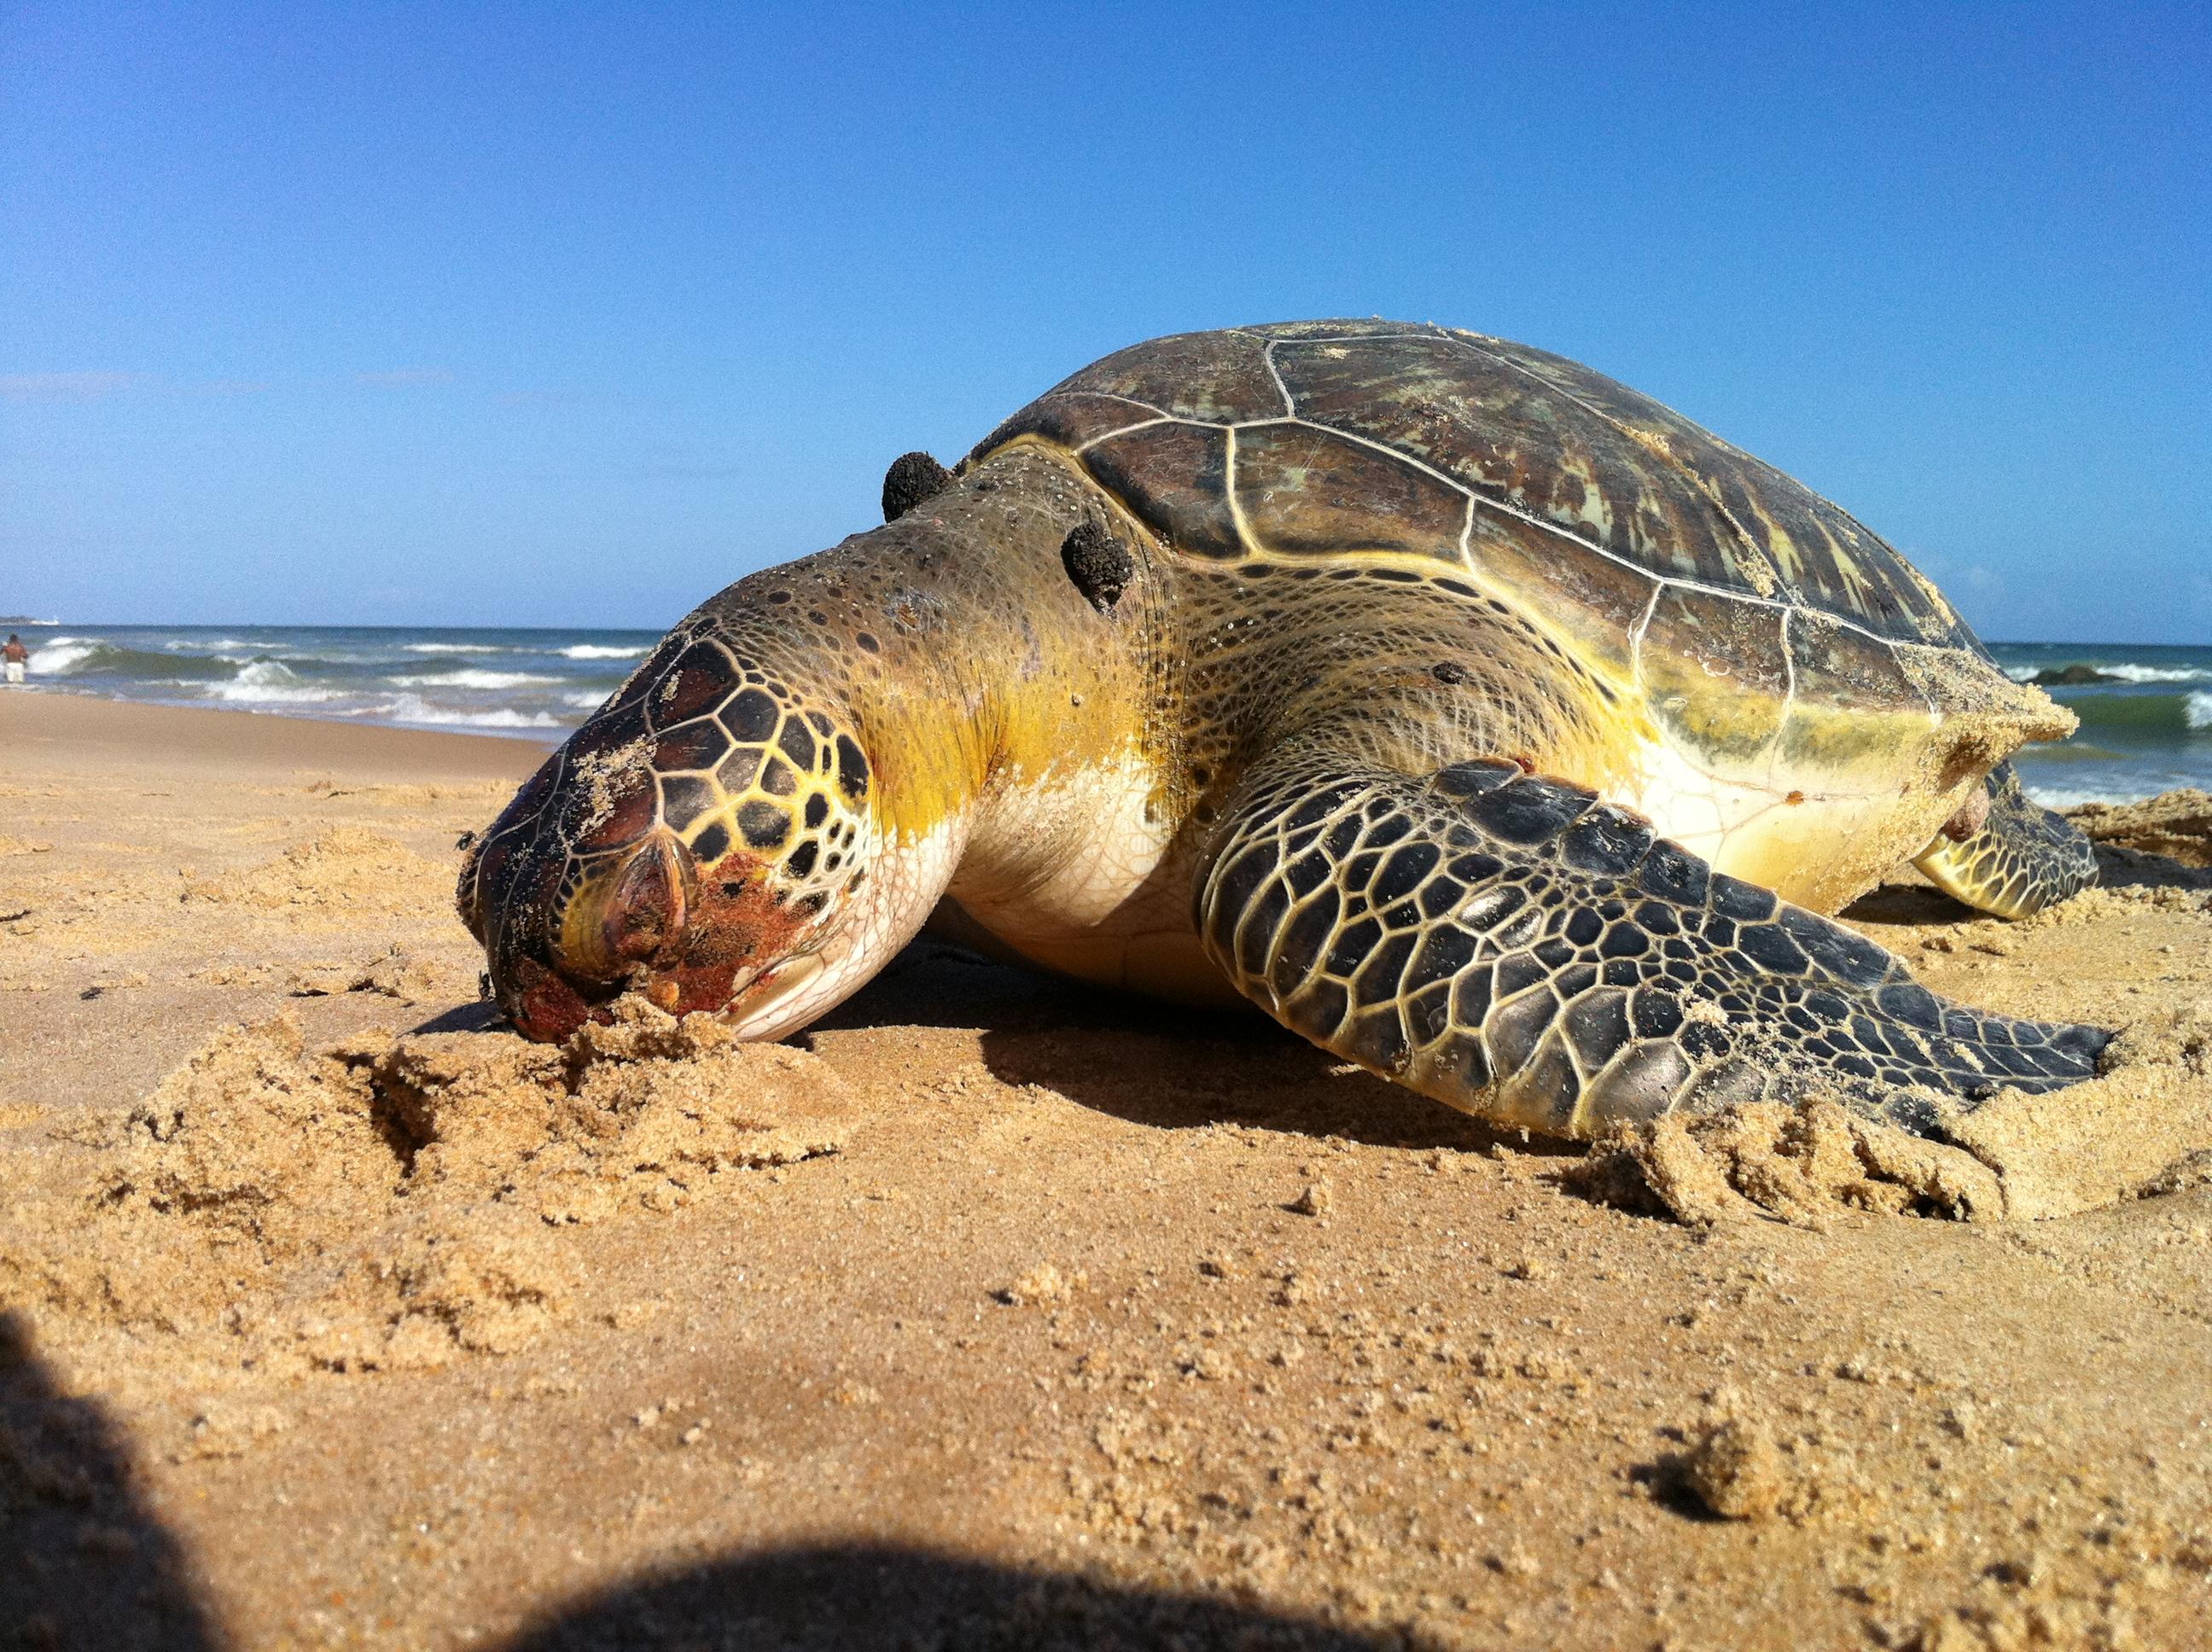 Tartaruga na praia de Patamares em Salvador (Foto: Renan Pinheiro/ TV Bahia)